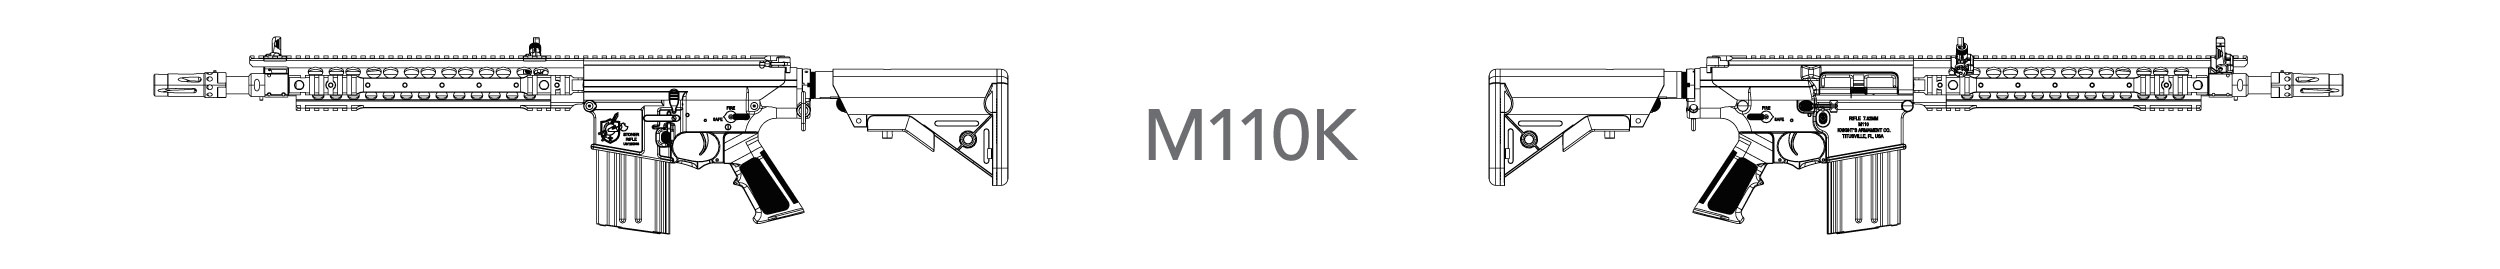 M110K.jpg